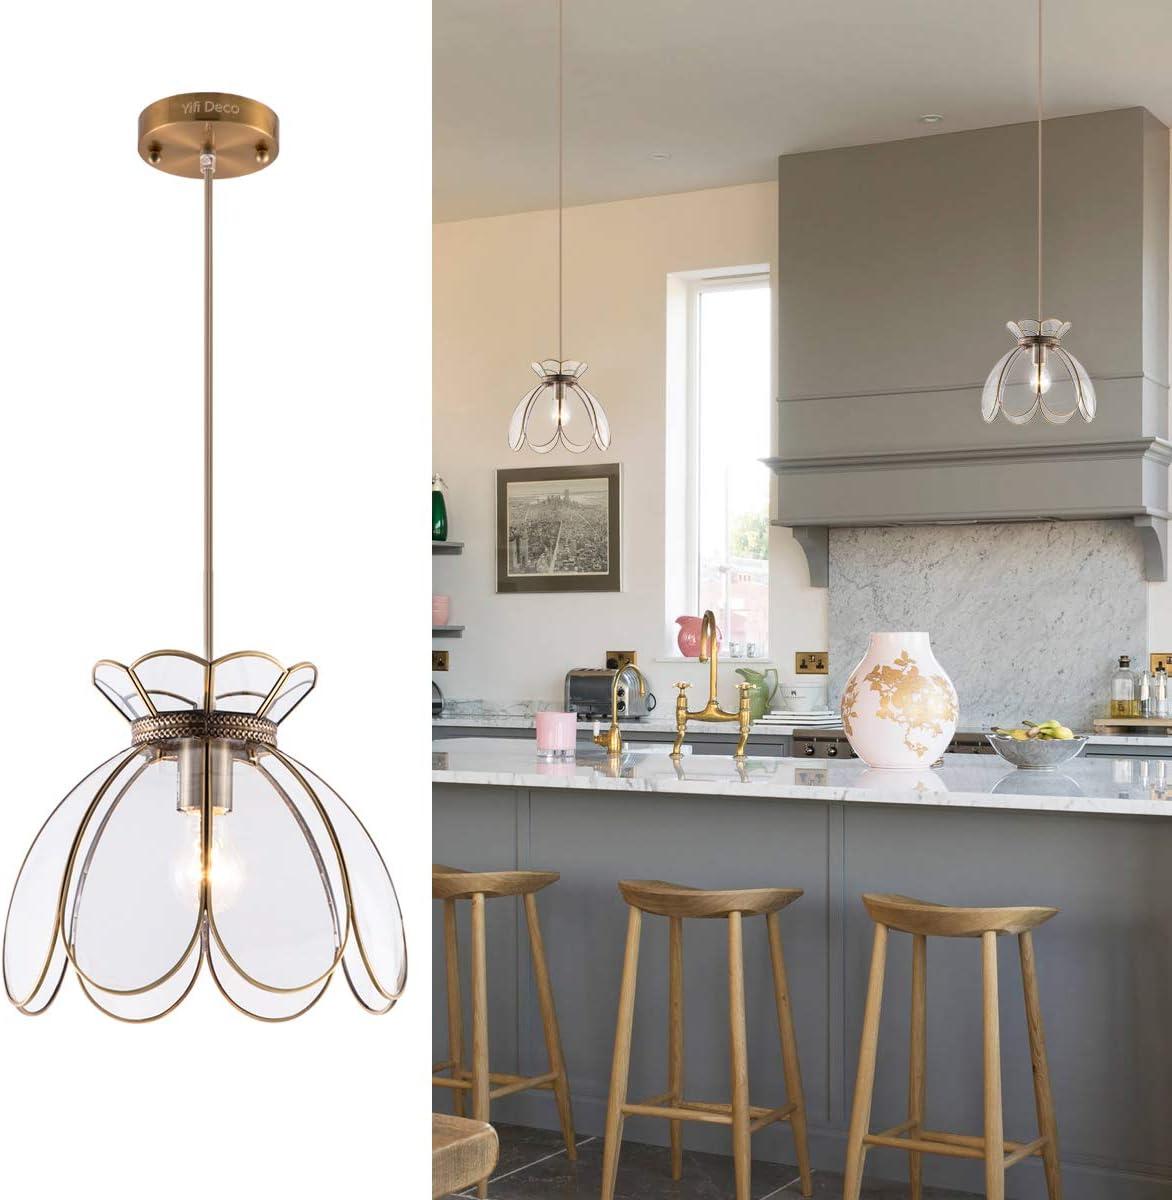 YIFI Deco Adjustable Pendant Light Brass Vintage Glass Lotus Flower Ceiling Pendant Light for Kitchen Island Dining Room Bedroom Living Room, Clear